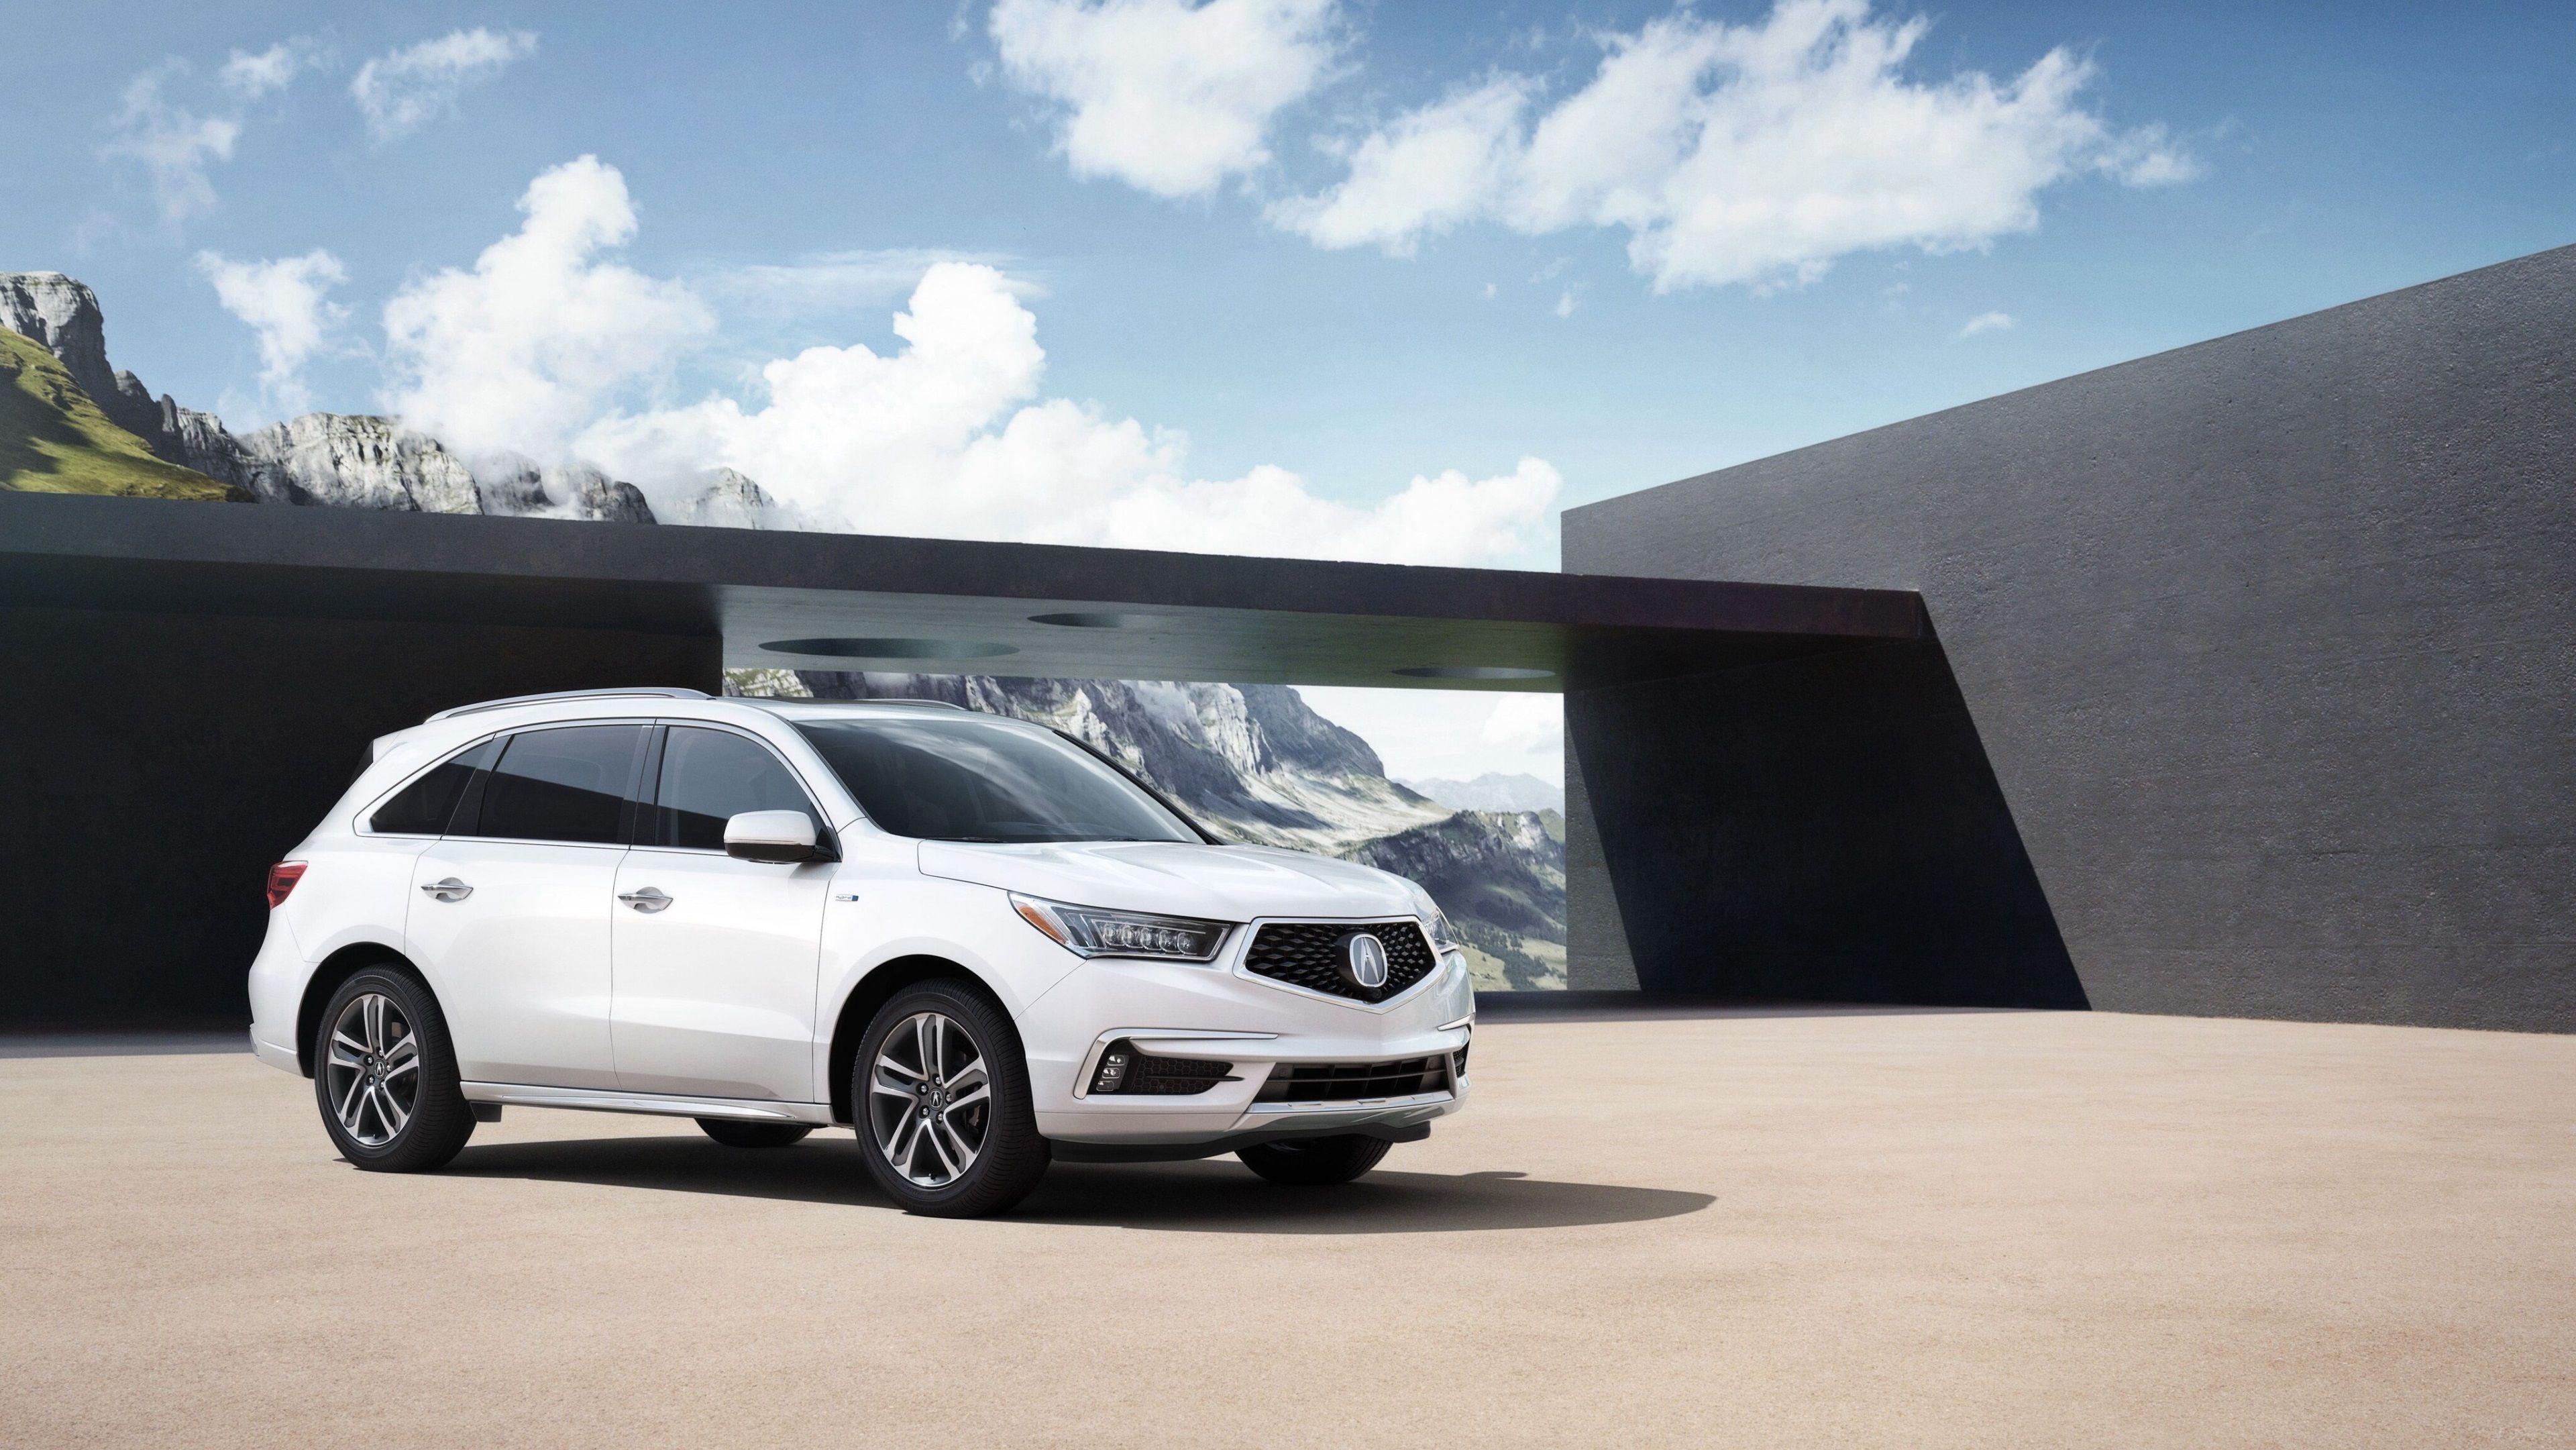 overview vehicle cost ridgeway mdx motors acura listings awd